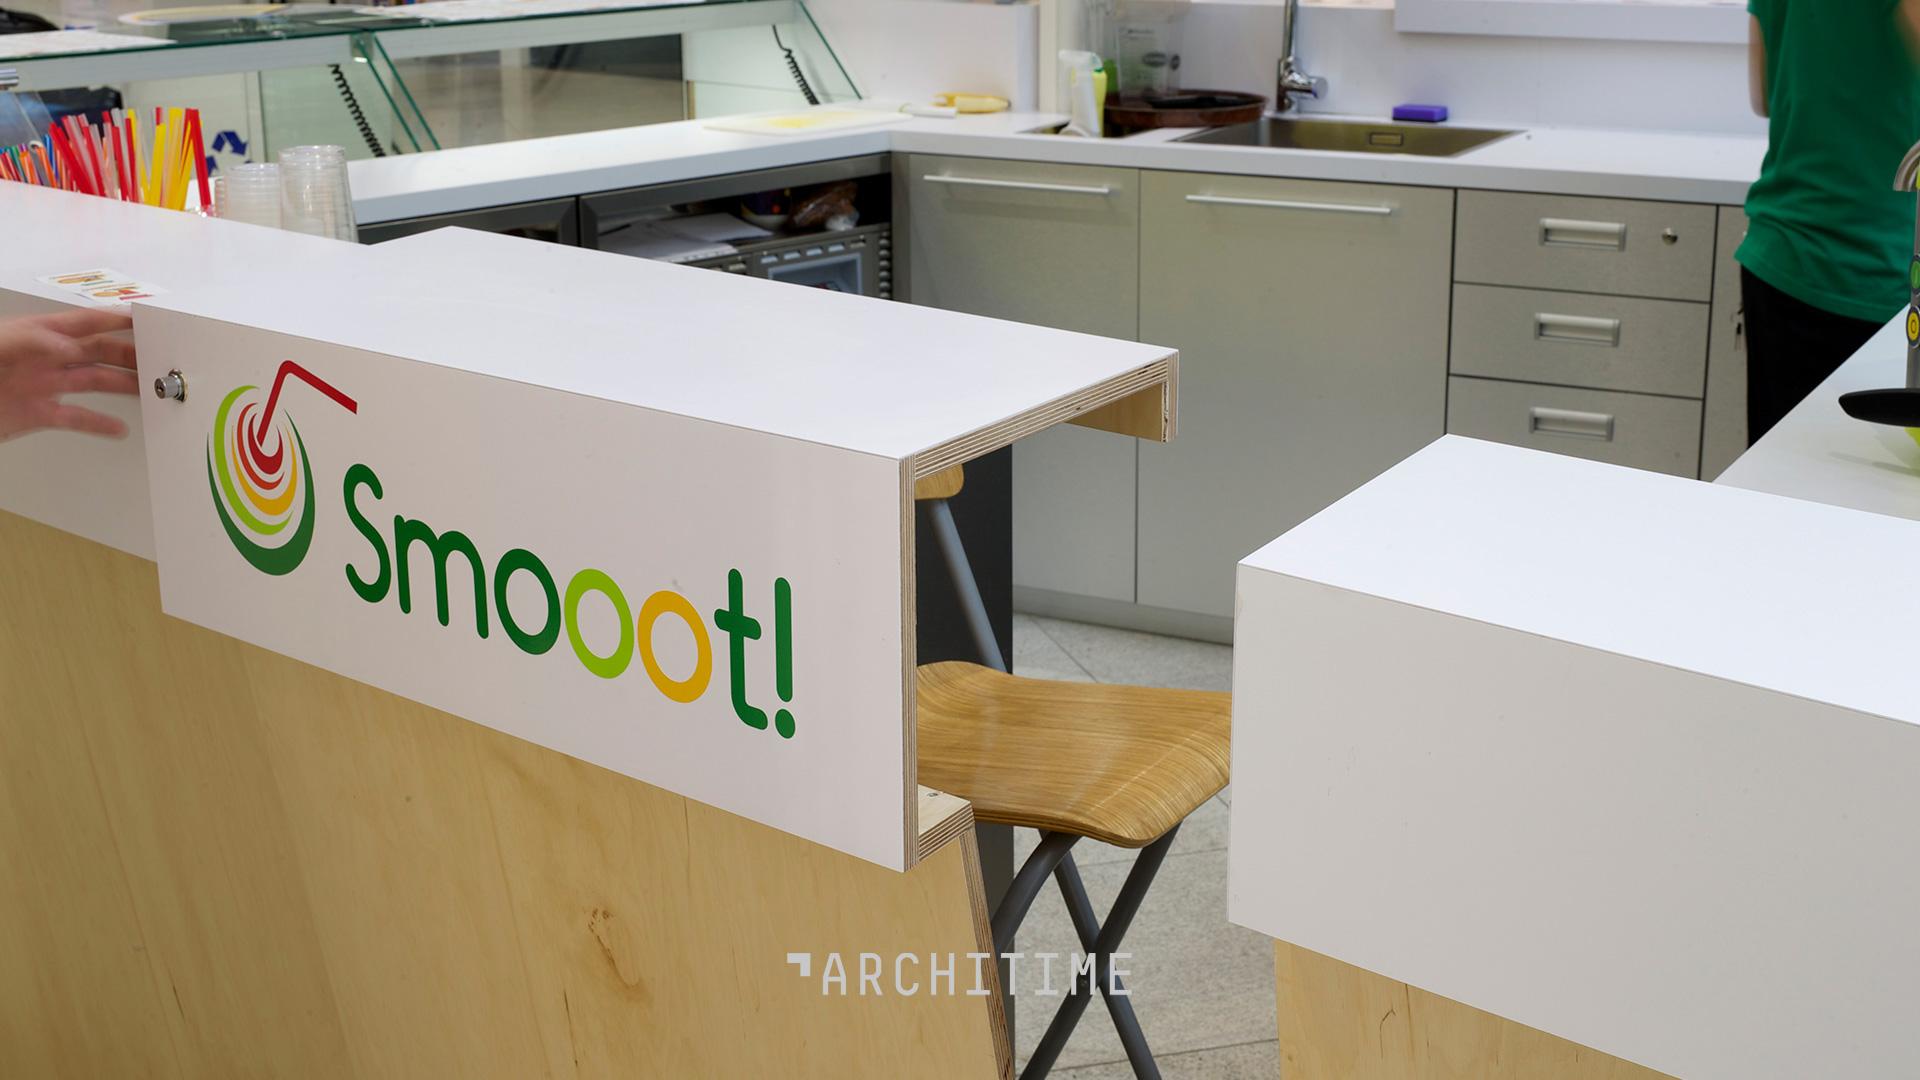 Smooot – Bory Mall